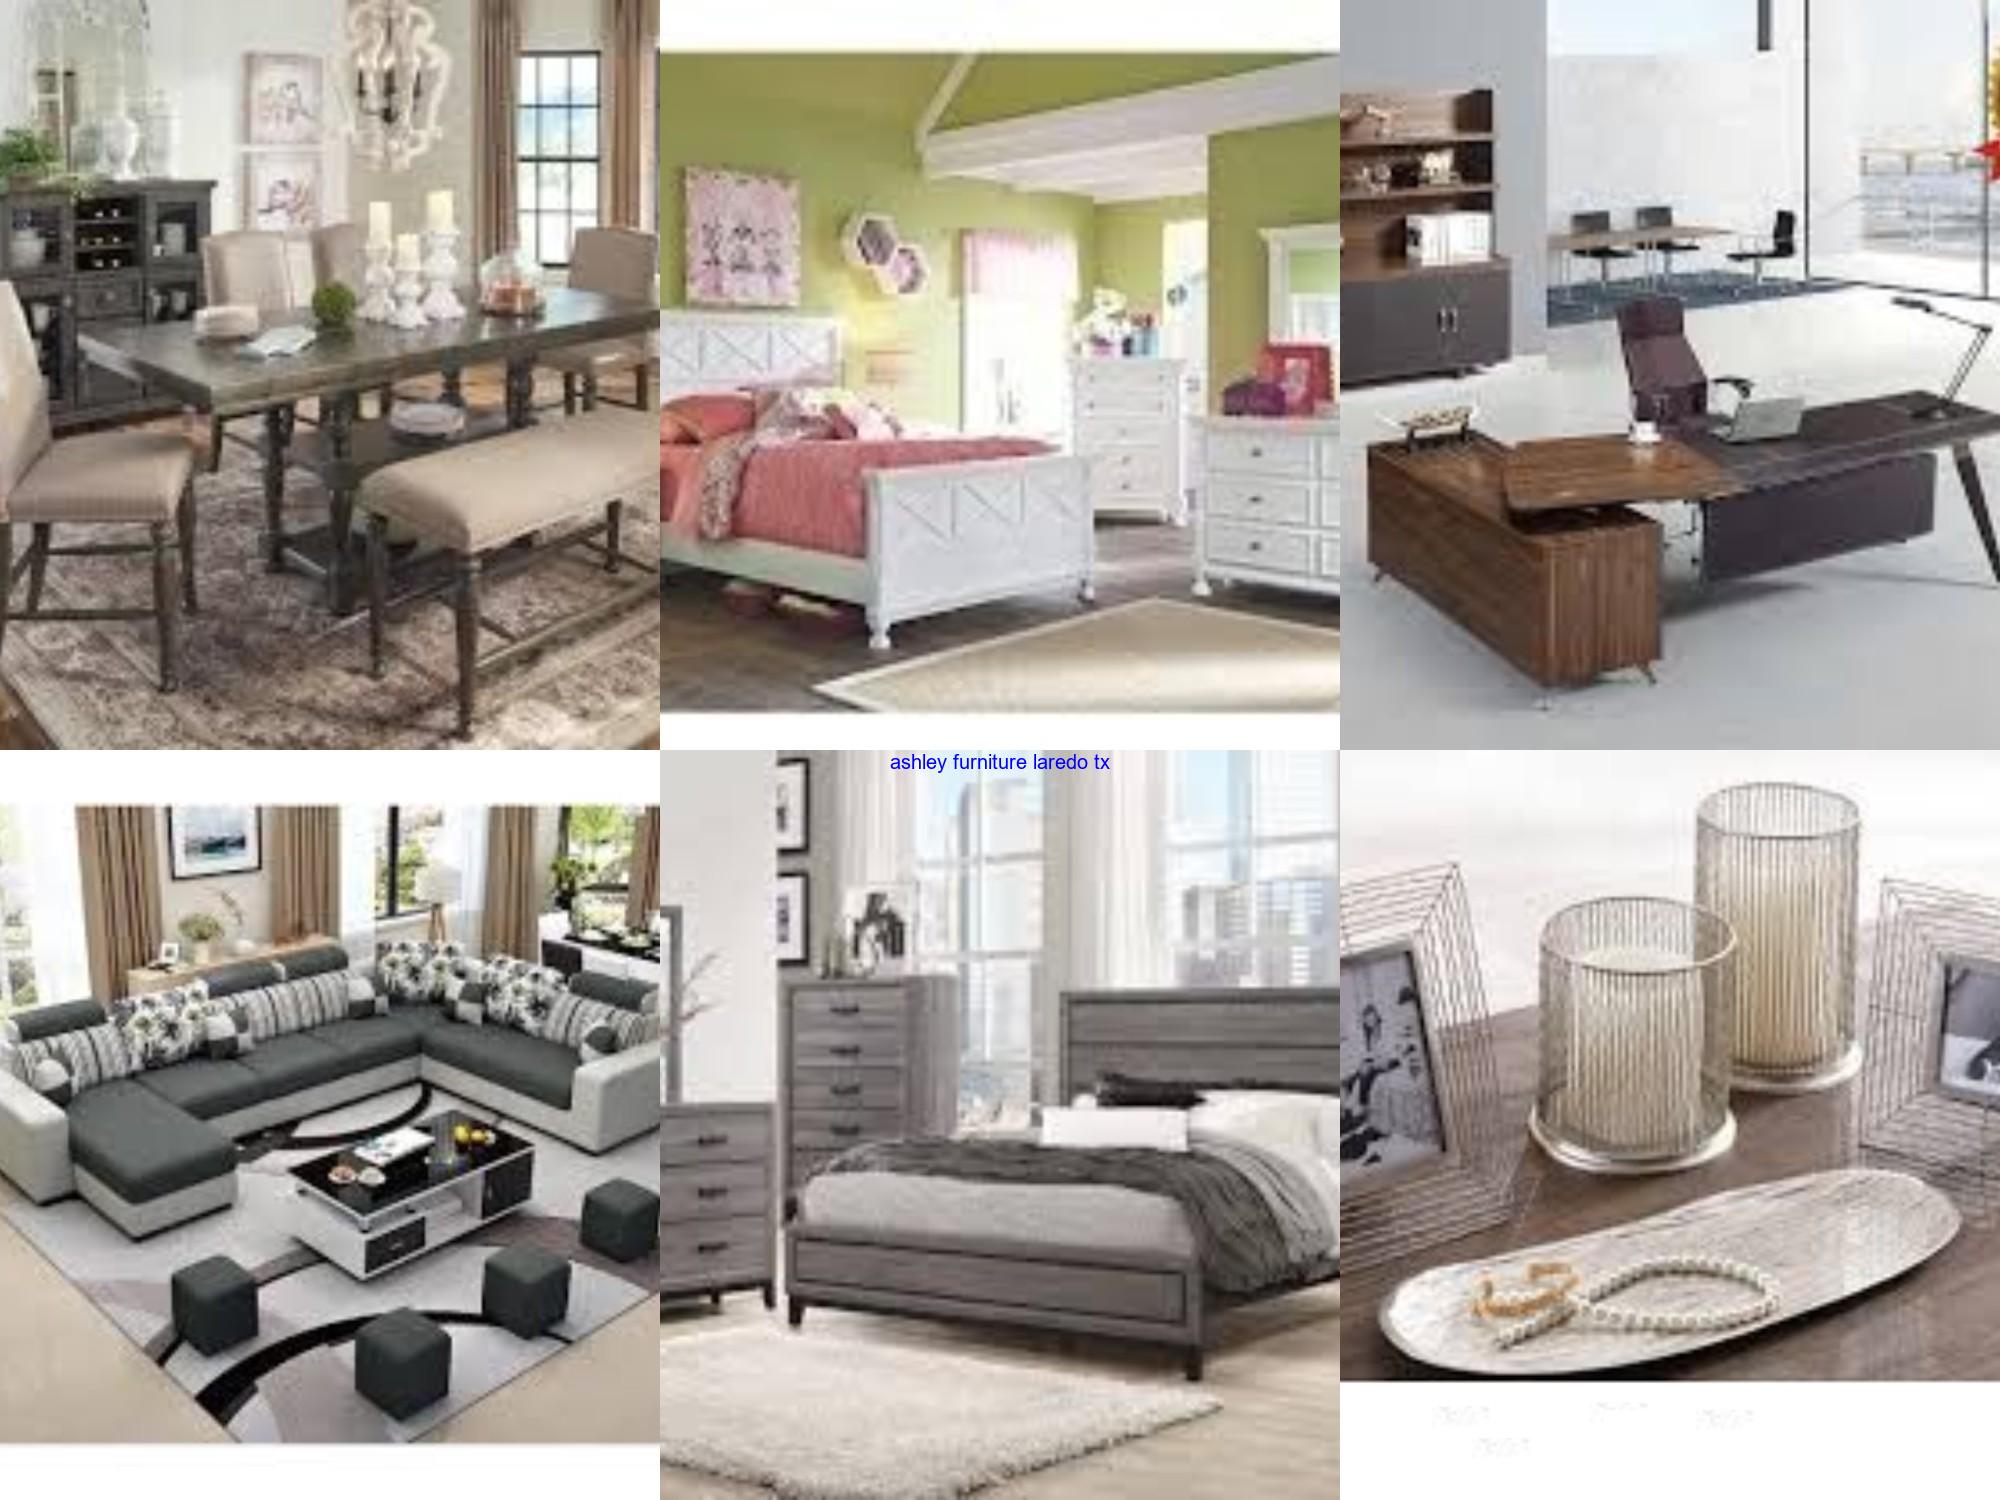 Ashley Furniture Laredo Tx In 2020 Furniture Prices Ashley Furniture Bedroom Set